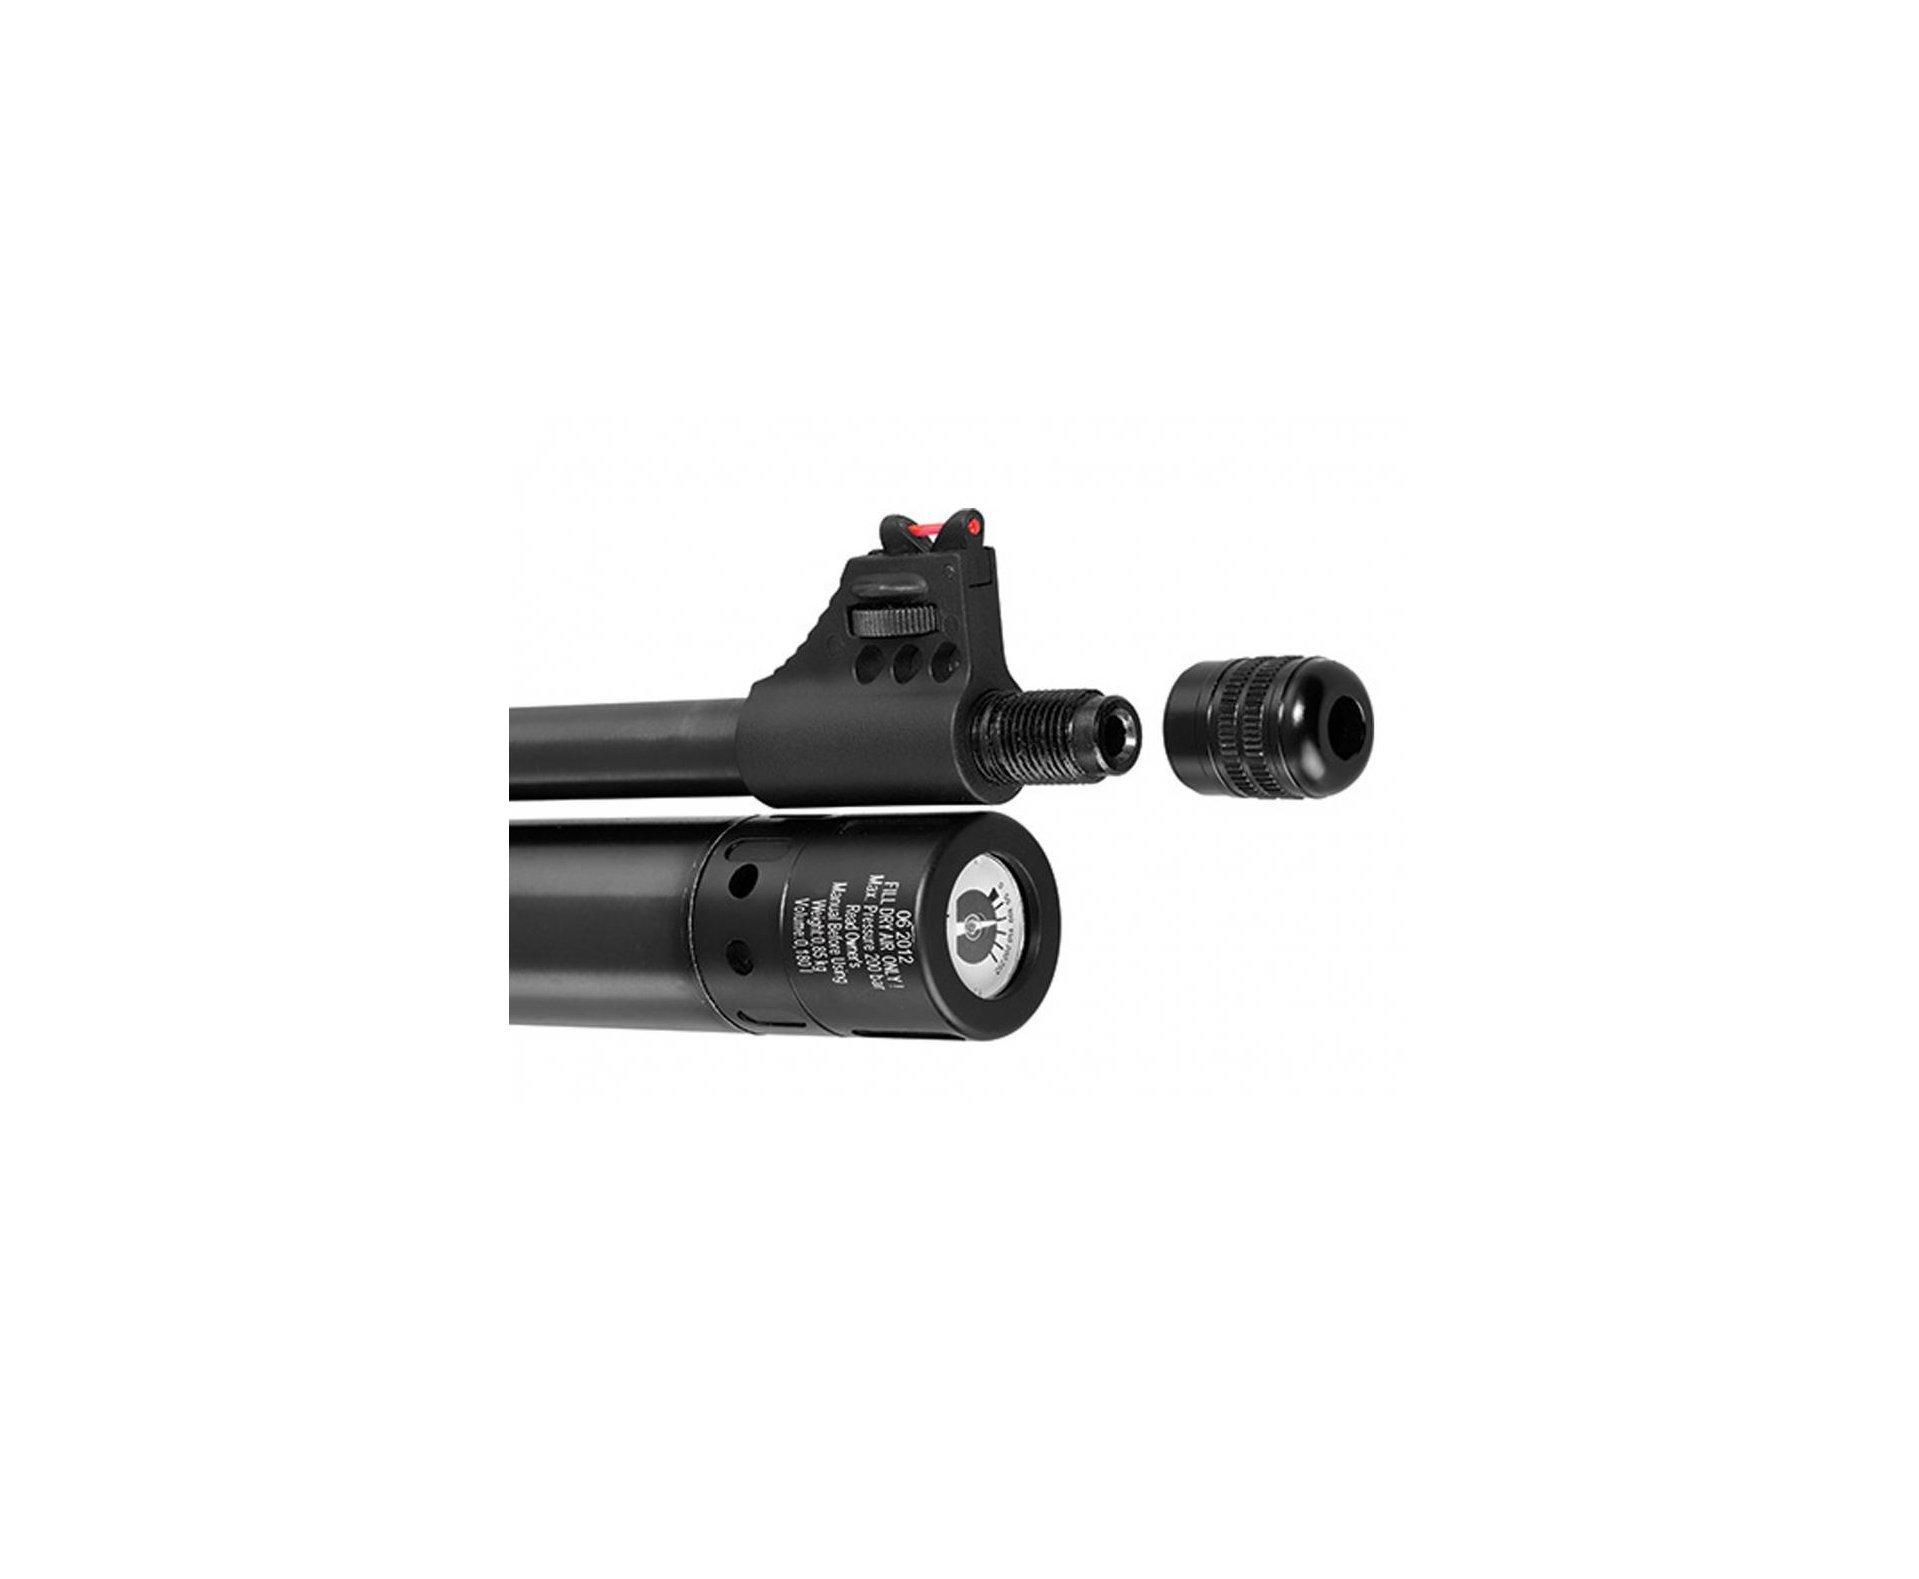 "Carabina De Pressão Hatsan Pcp At44 - Calibre 4,5 Mm + Capa 46"""